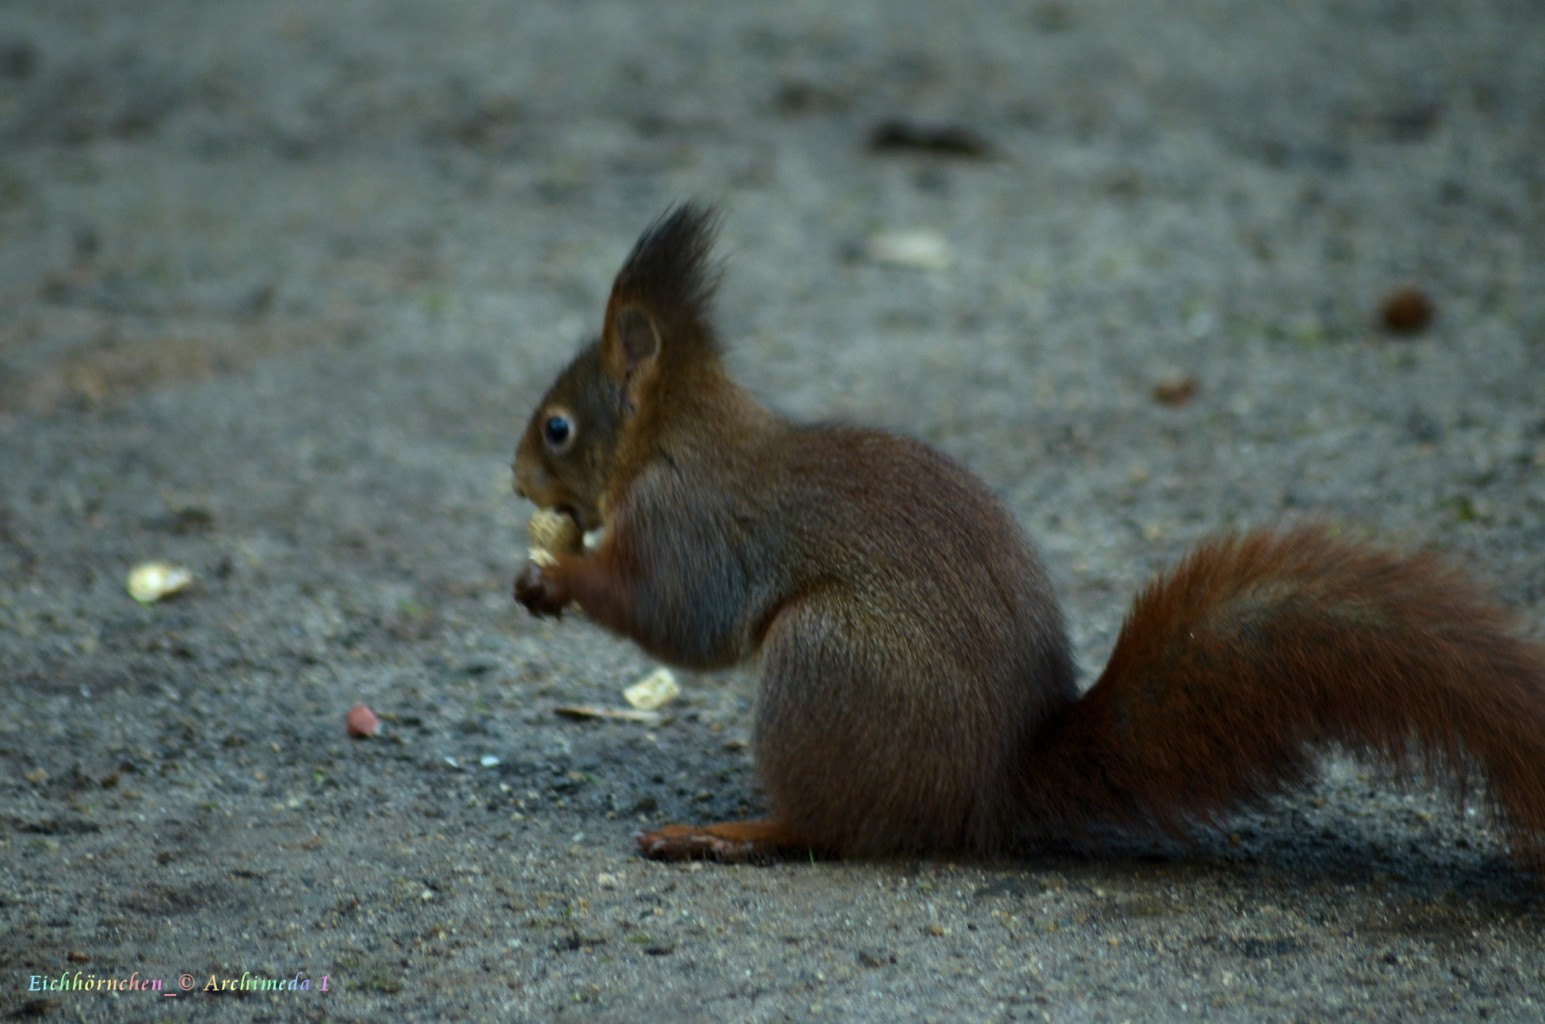 Eichhörnchen_© Archimeda 1_5